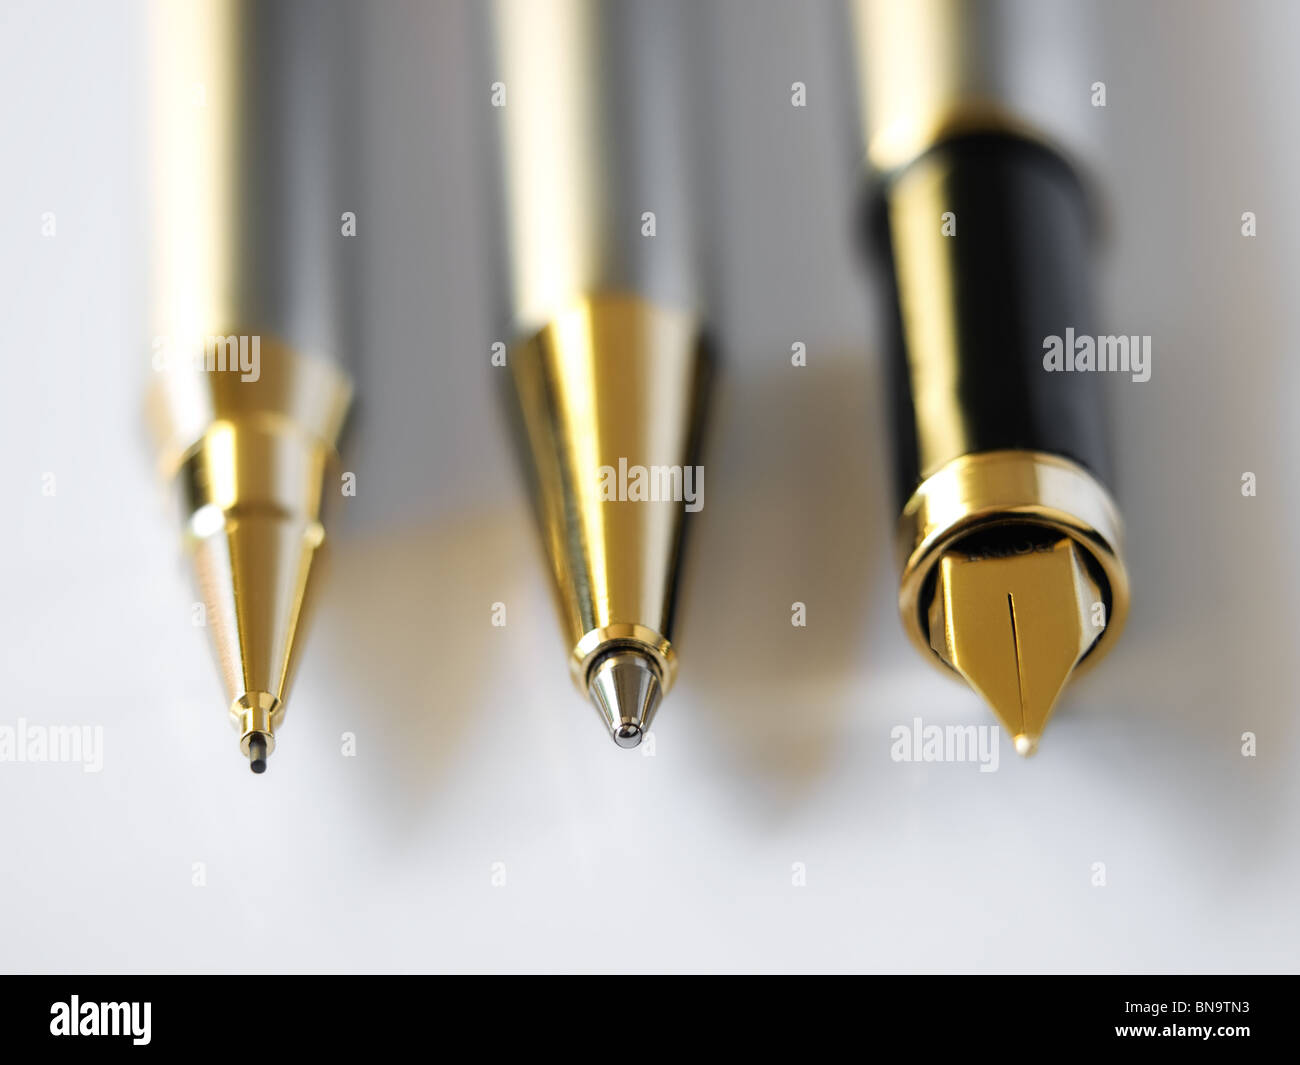 Closeup Three Common Types Pens Stock Photos Closeup Three Common